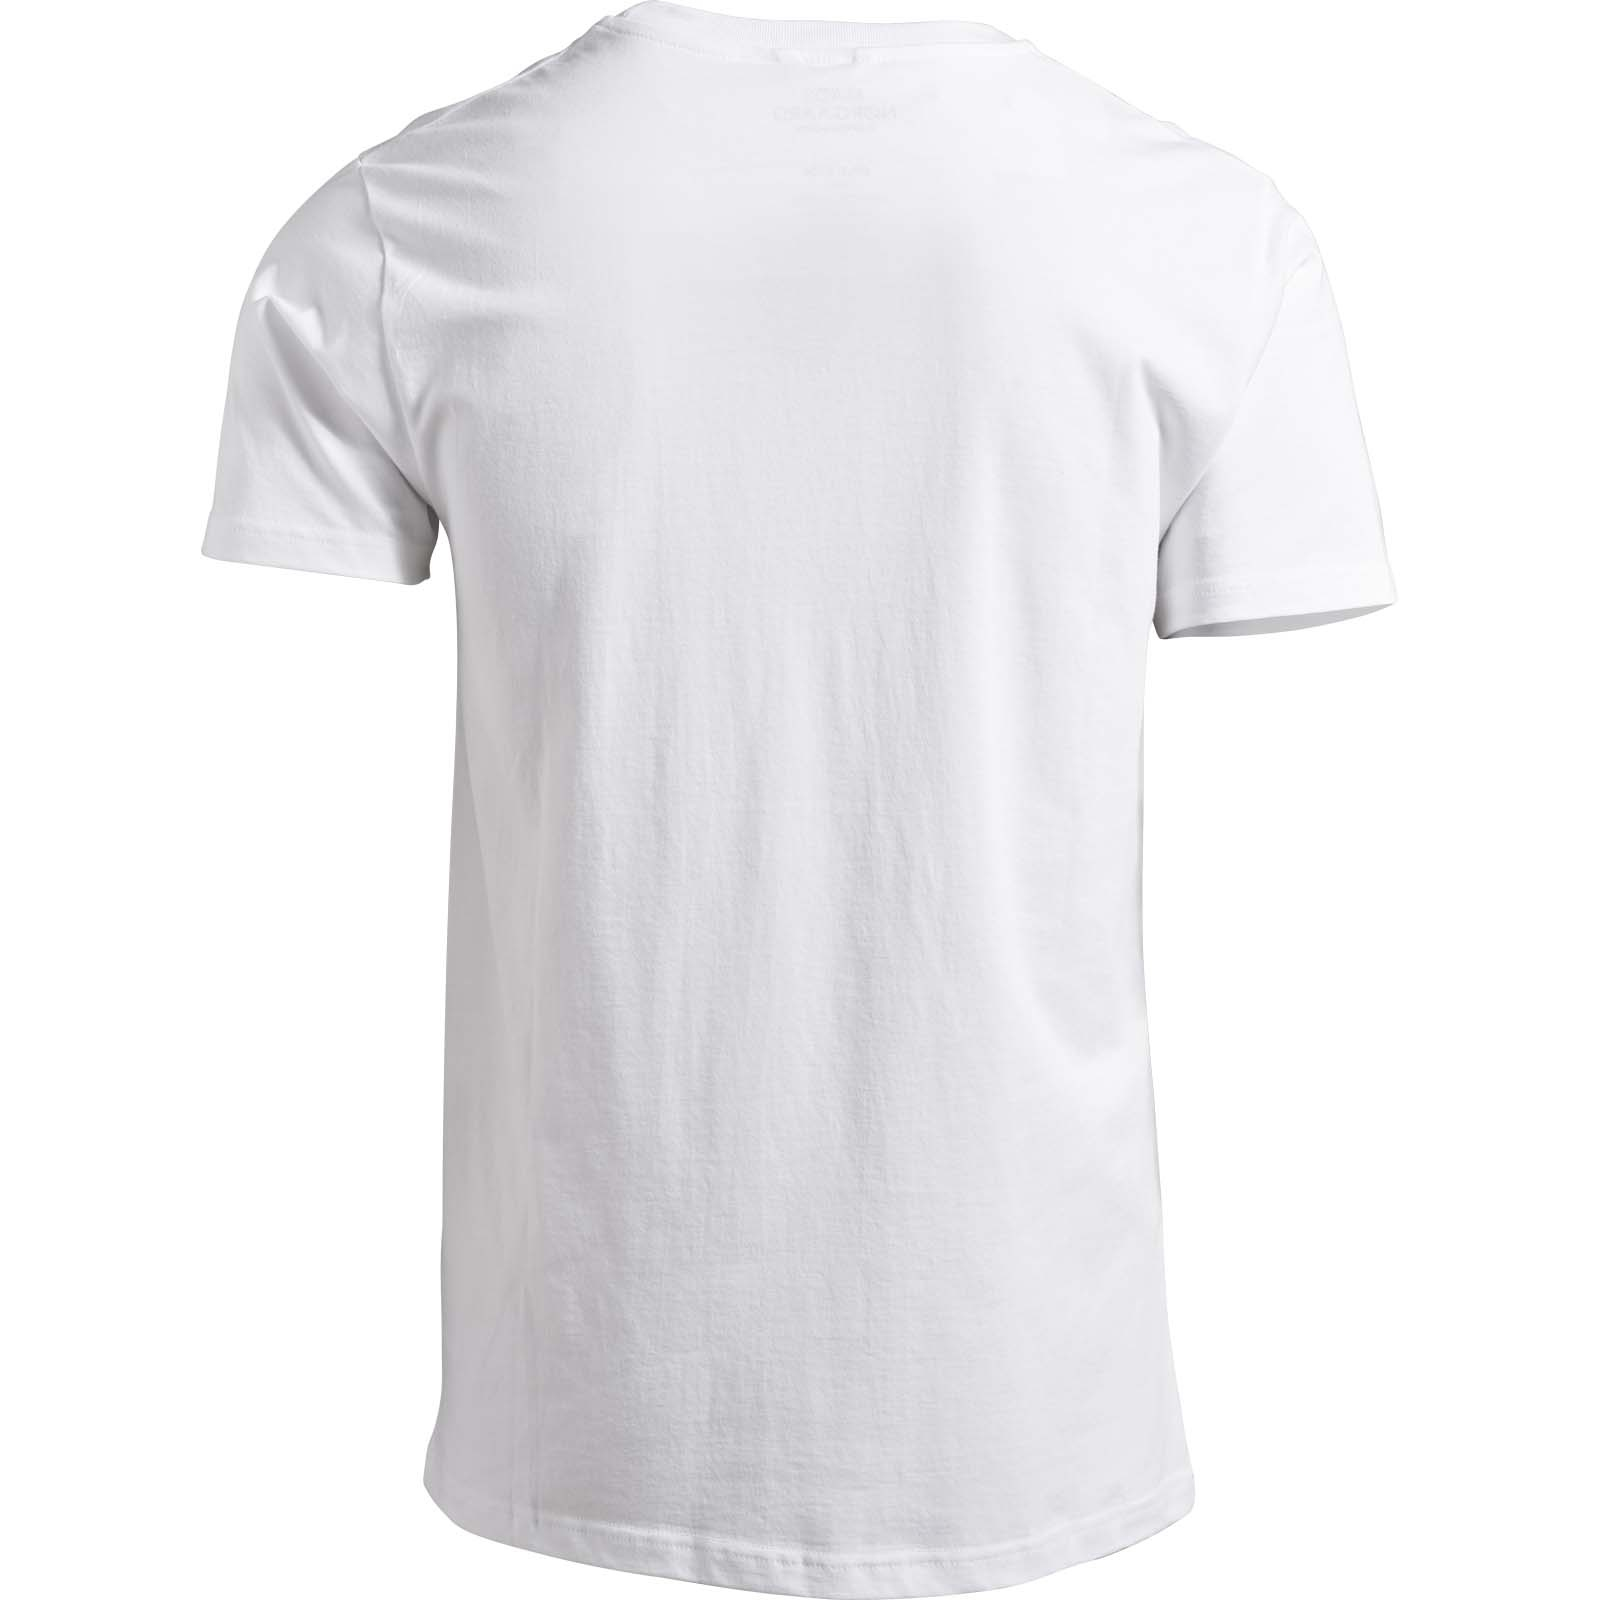 Mads Nørgaard Thor t-shirt, white, xx-large